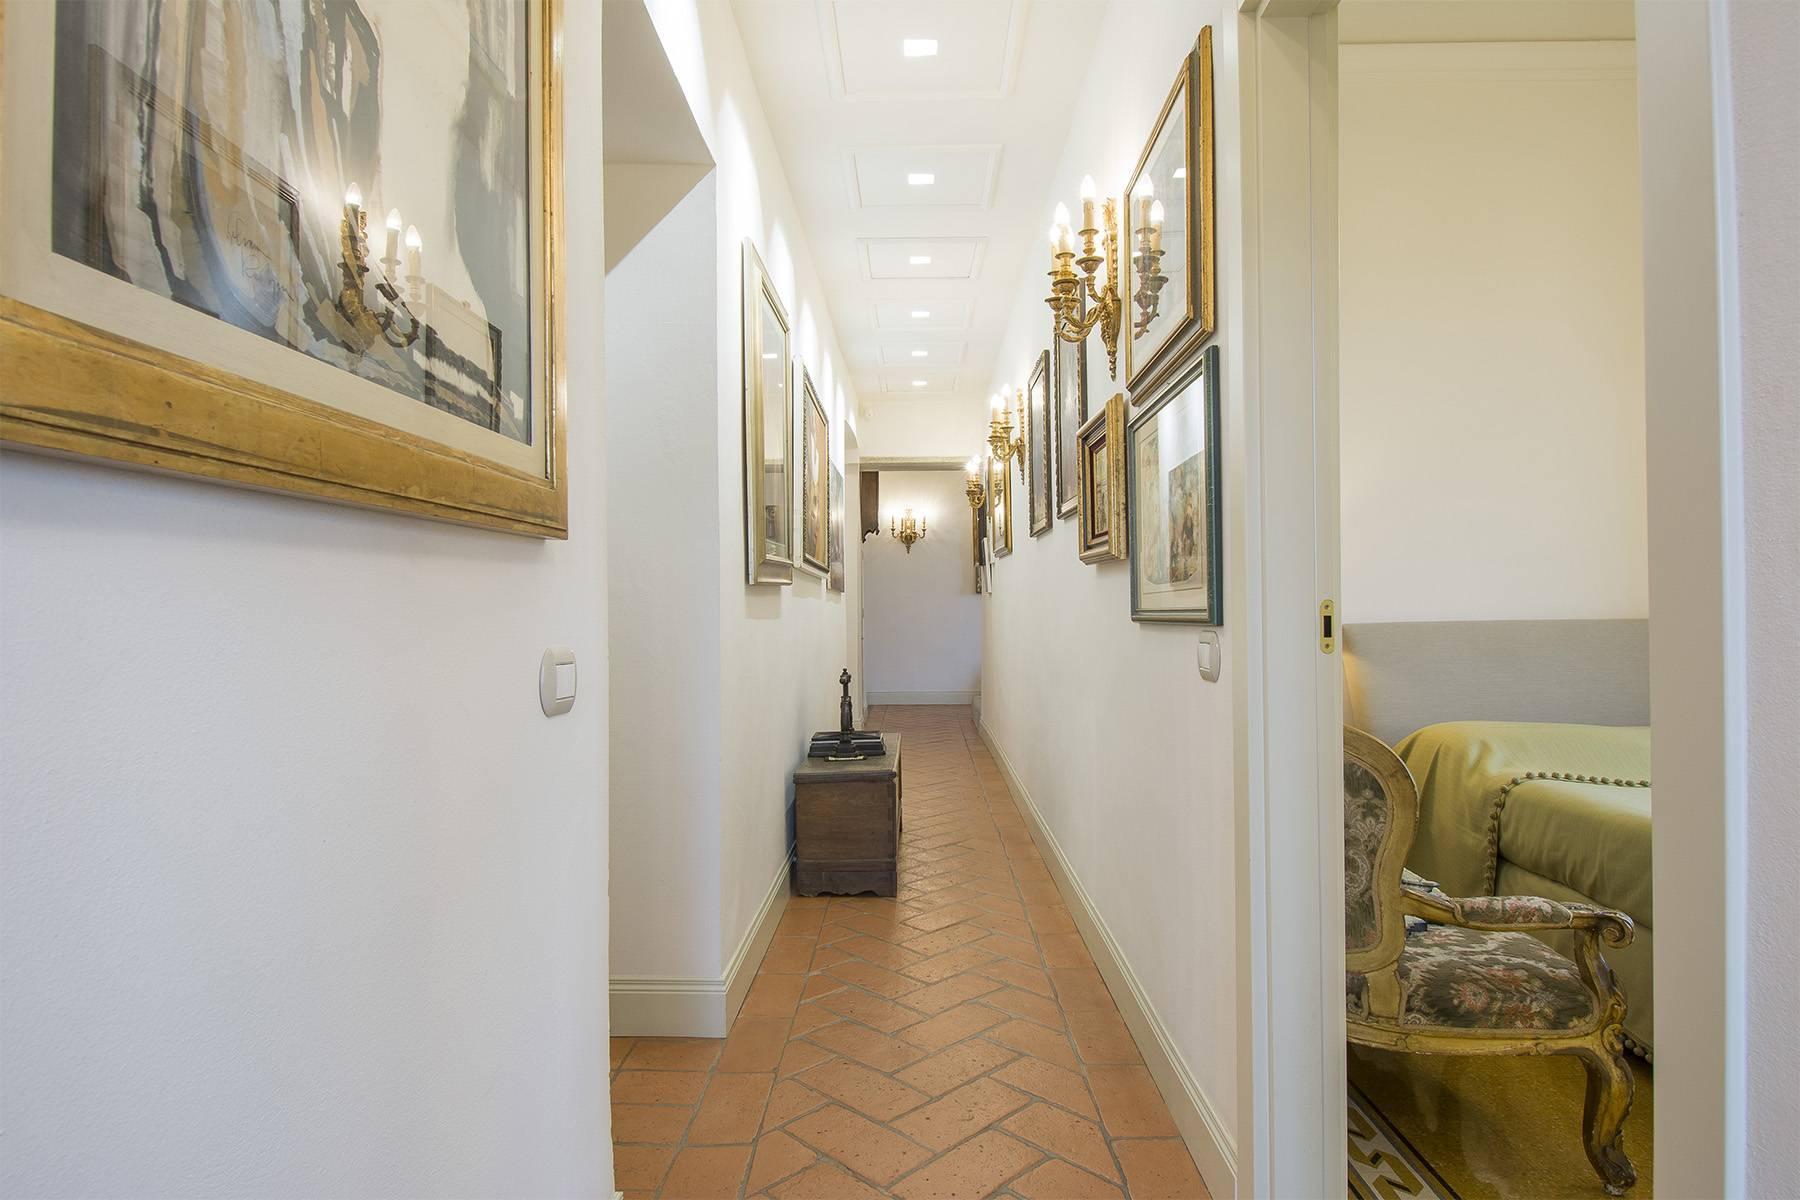 Exquisite apartment within a historic villa - 16